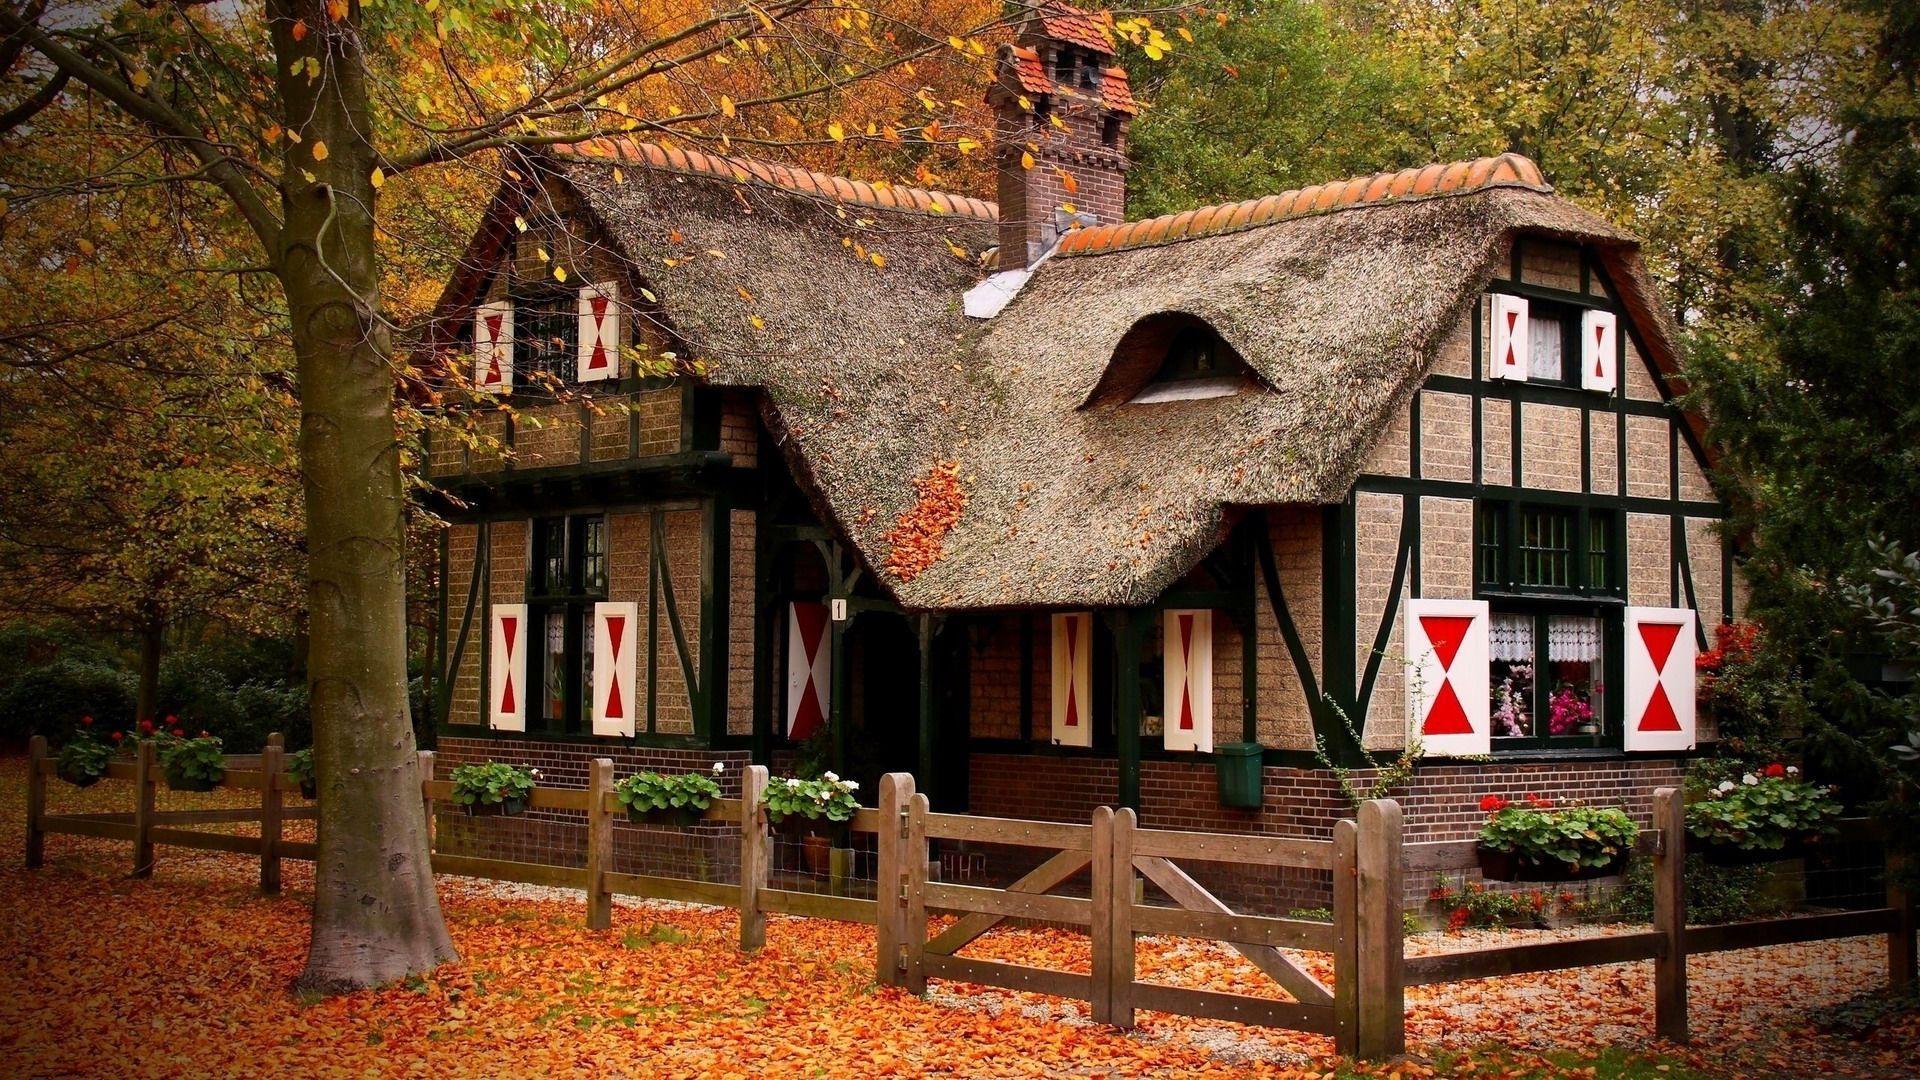 Cozy Wallpaper House cozy autumn trees hd 1920x1080